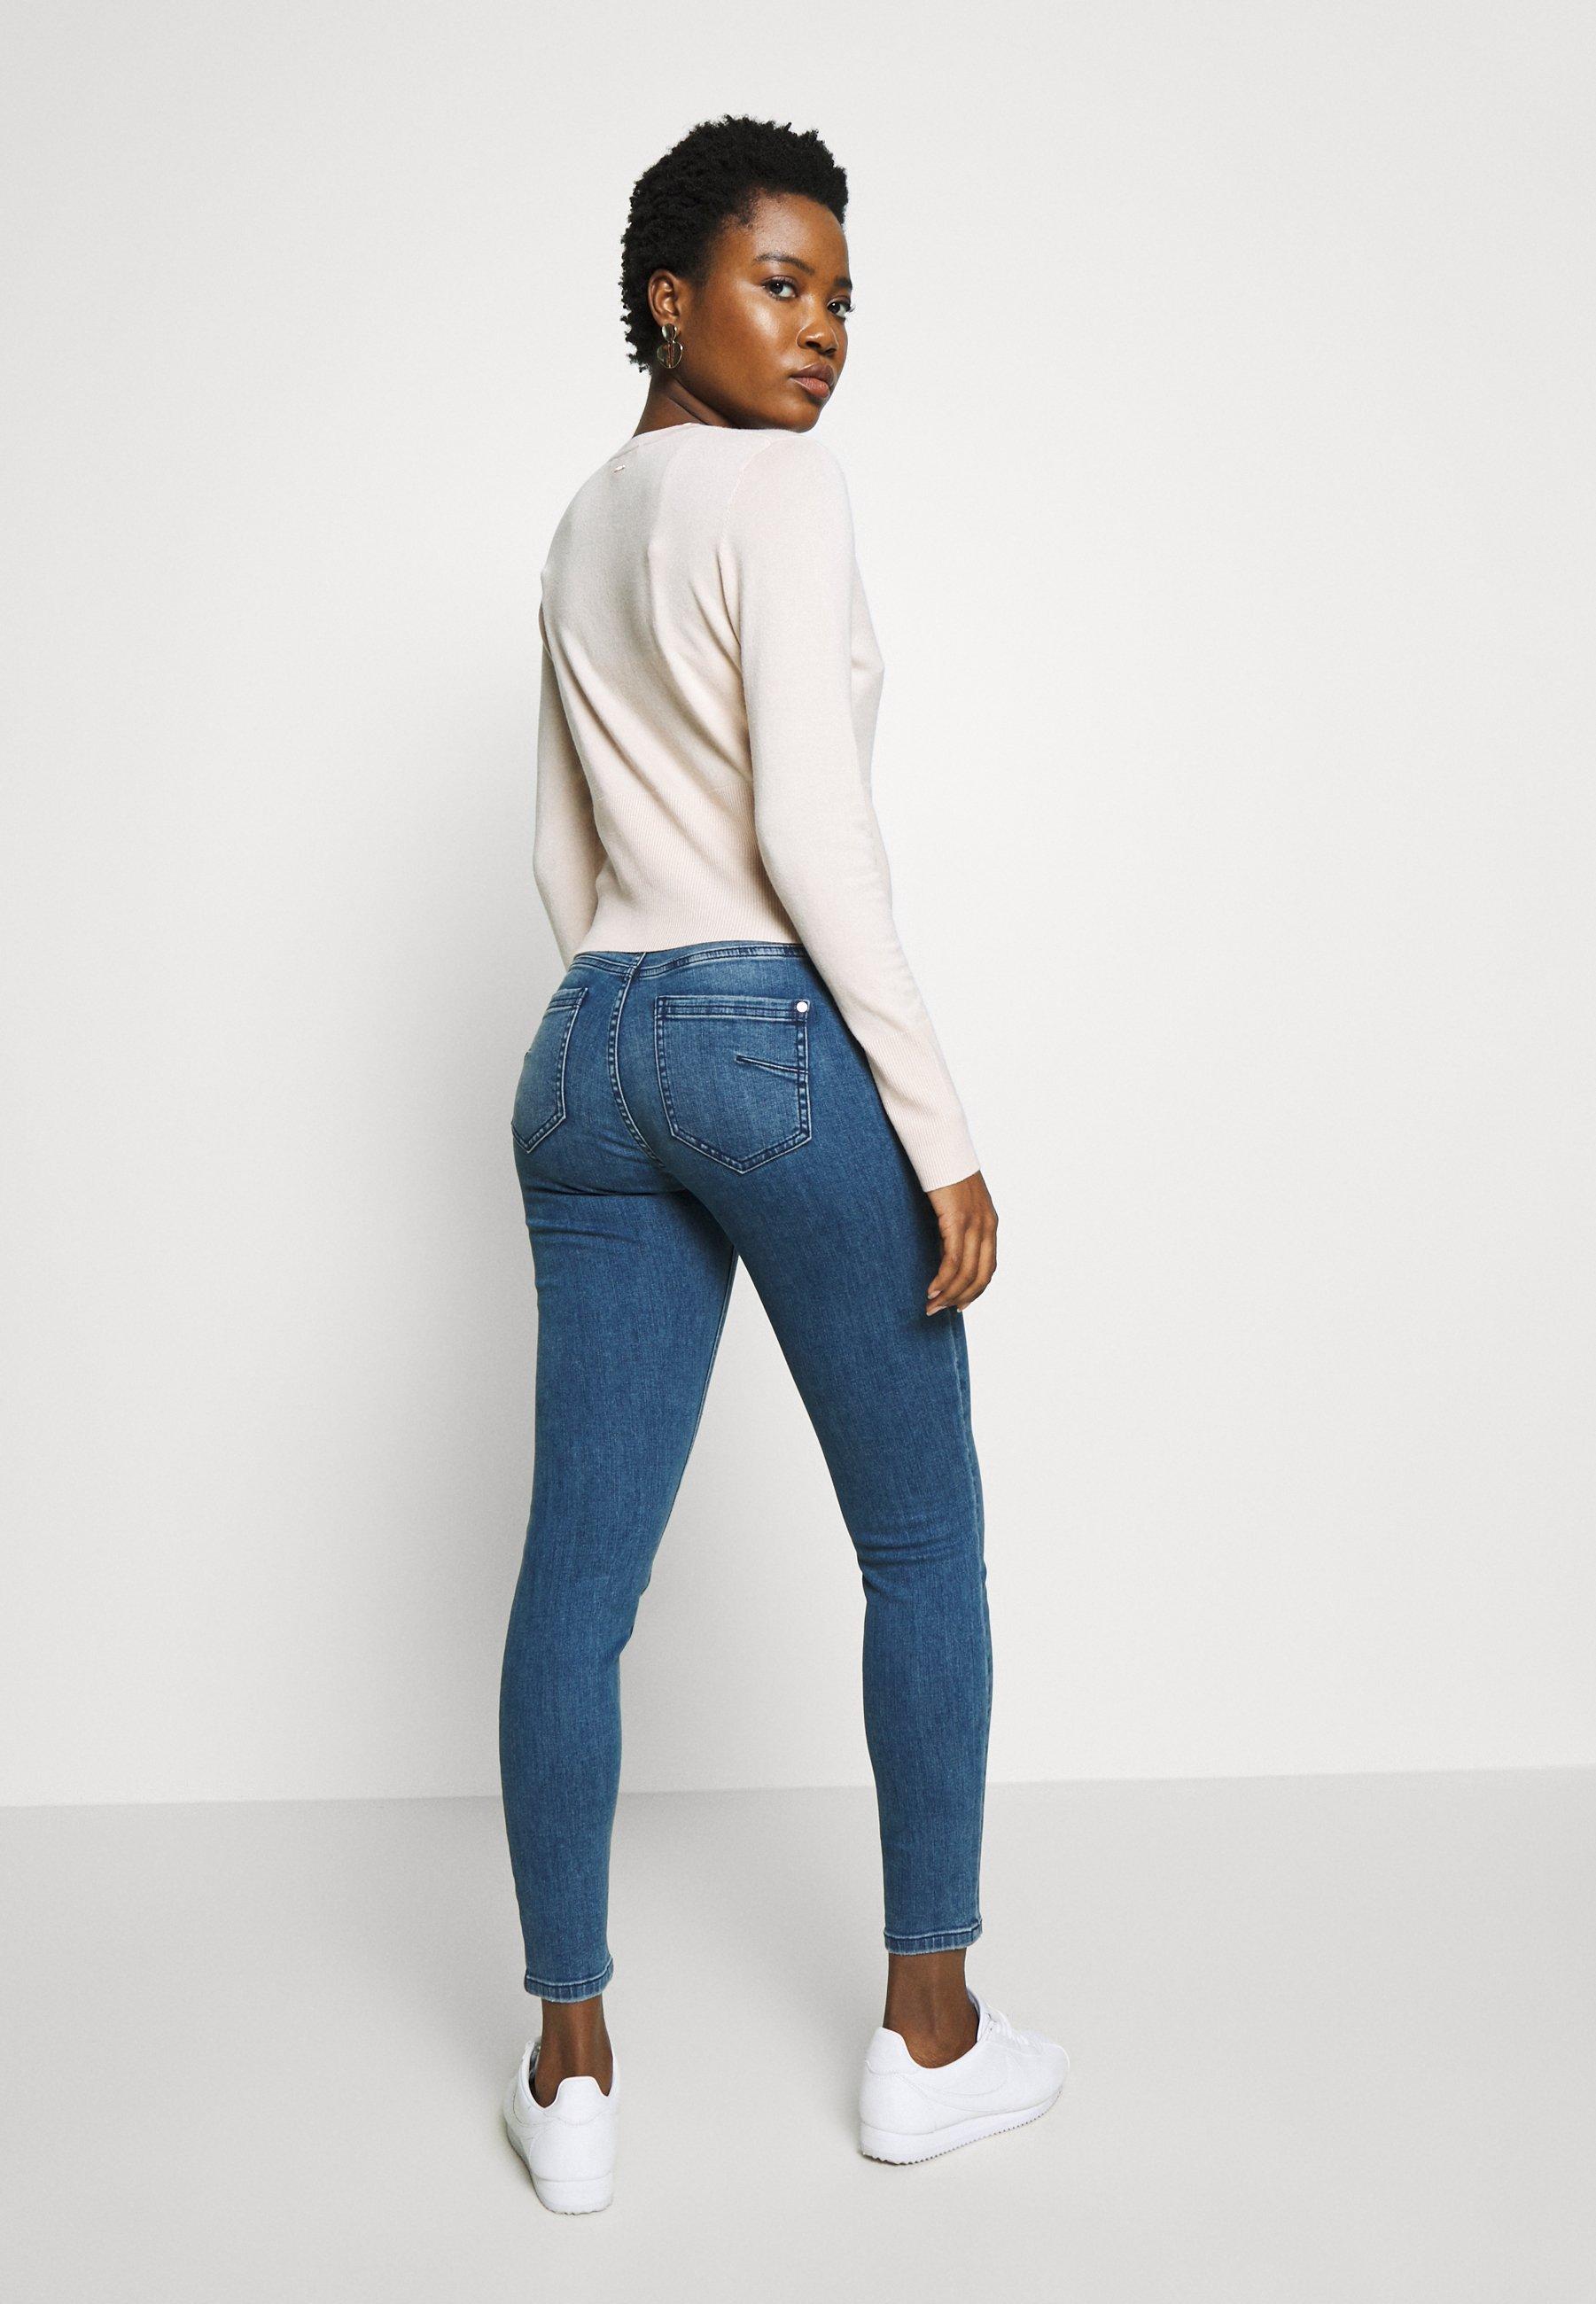 Comma Casual Identity Jeans Slim Fit - Blue Denim Stretch